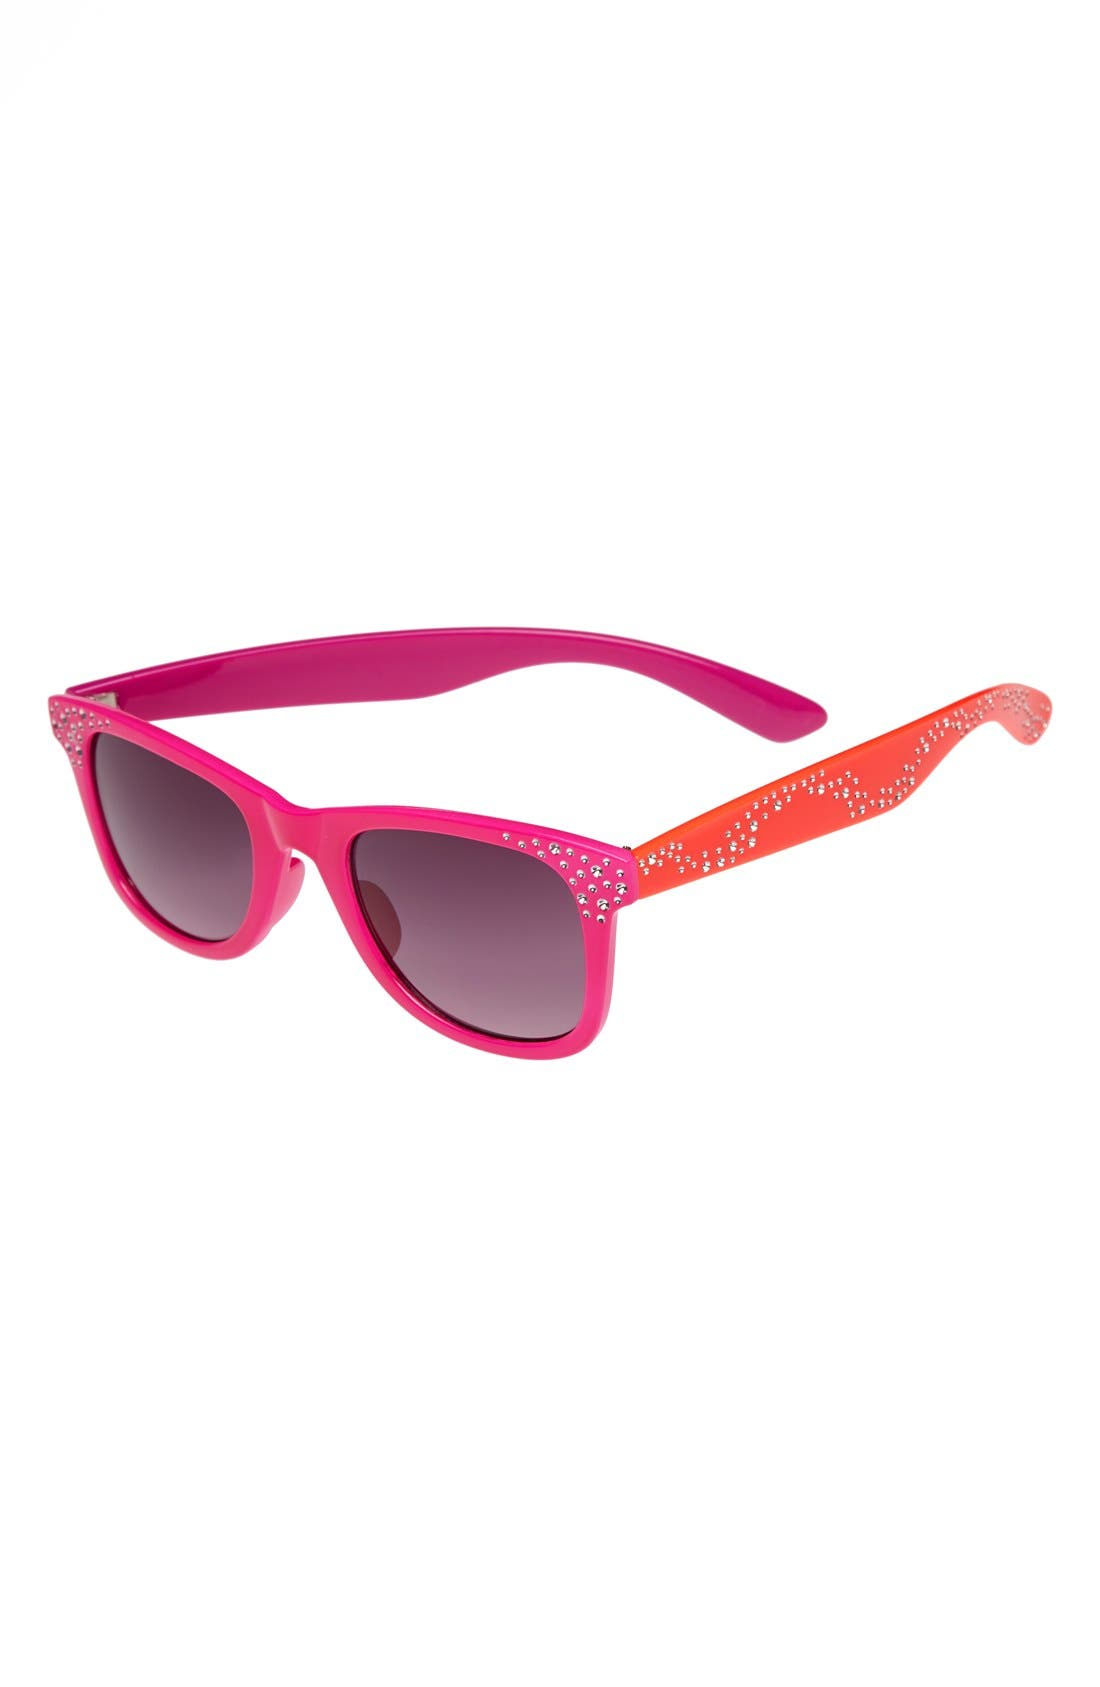 Alternate Image 1 Selected - Fantas Eyes Retro Sunglasses (Girls)